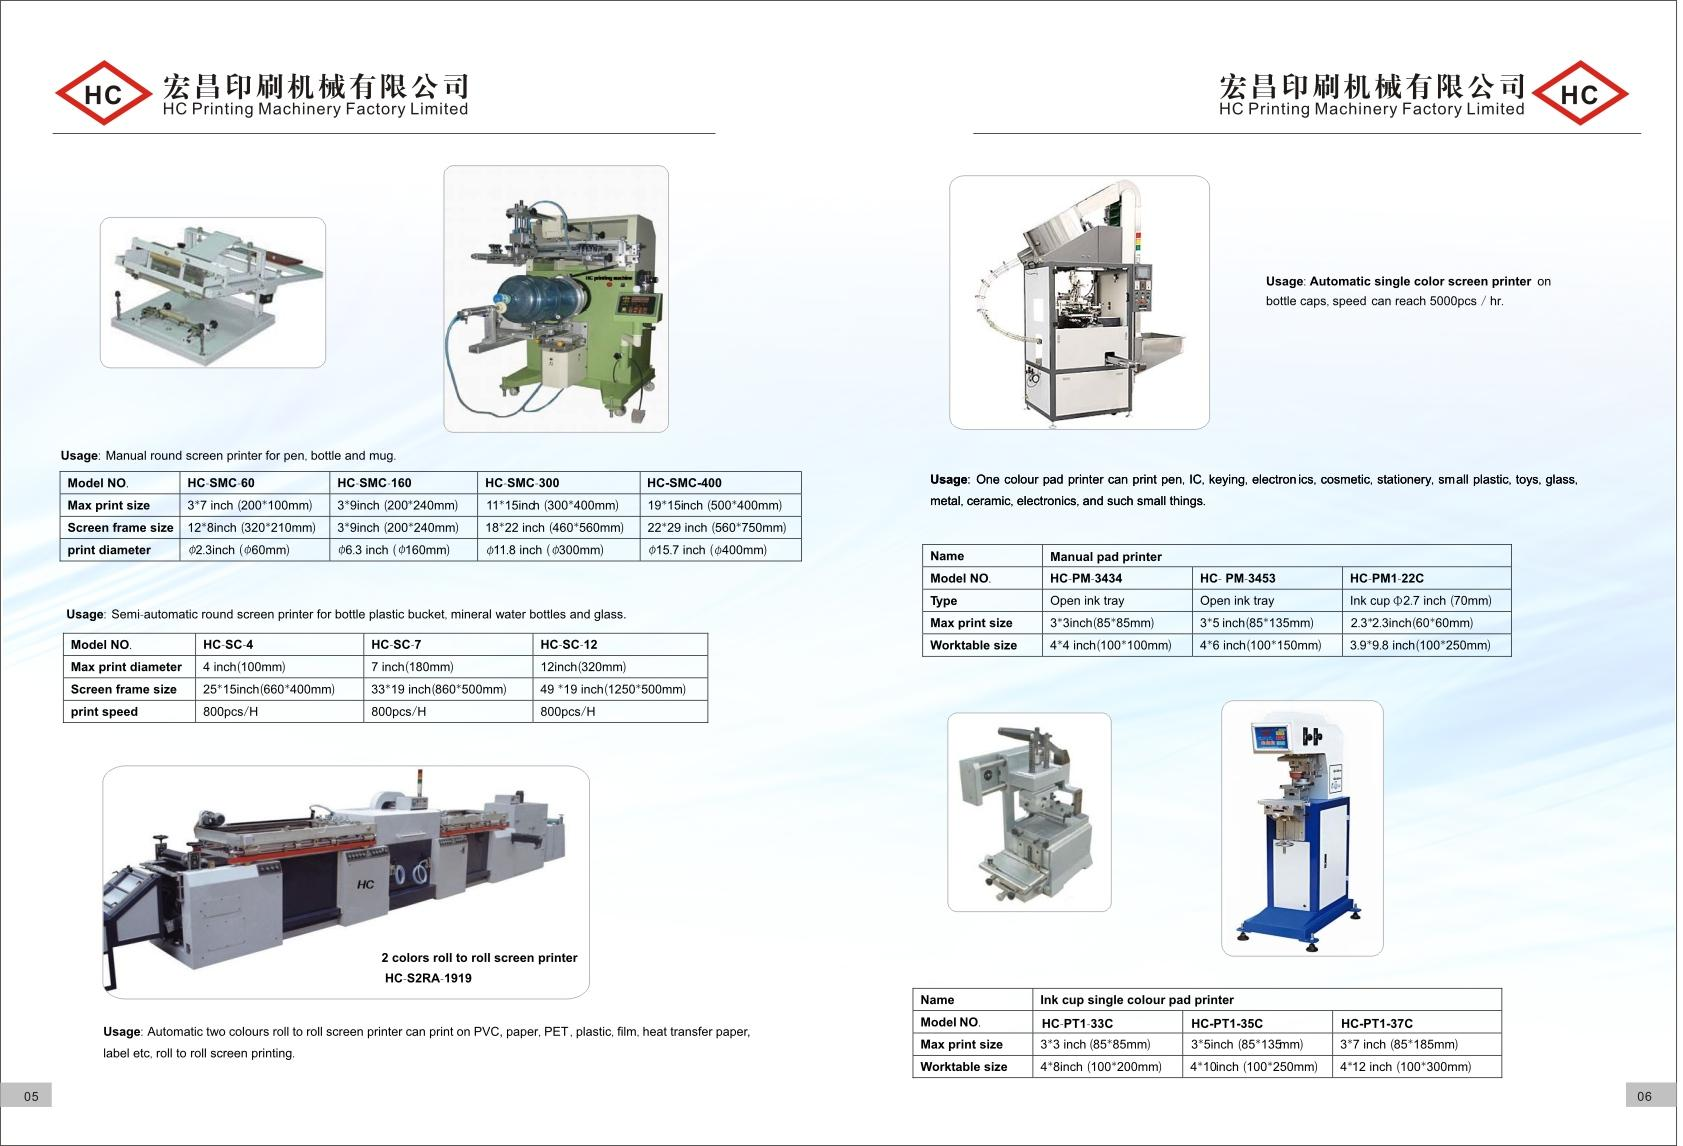 screen printer, pad printer, hot stamp machine, heat transfer machine, sublimat 7